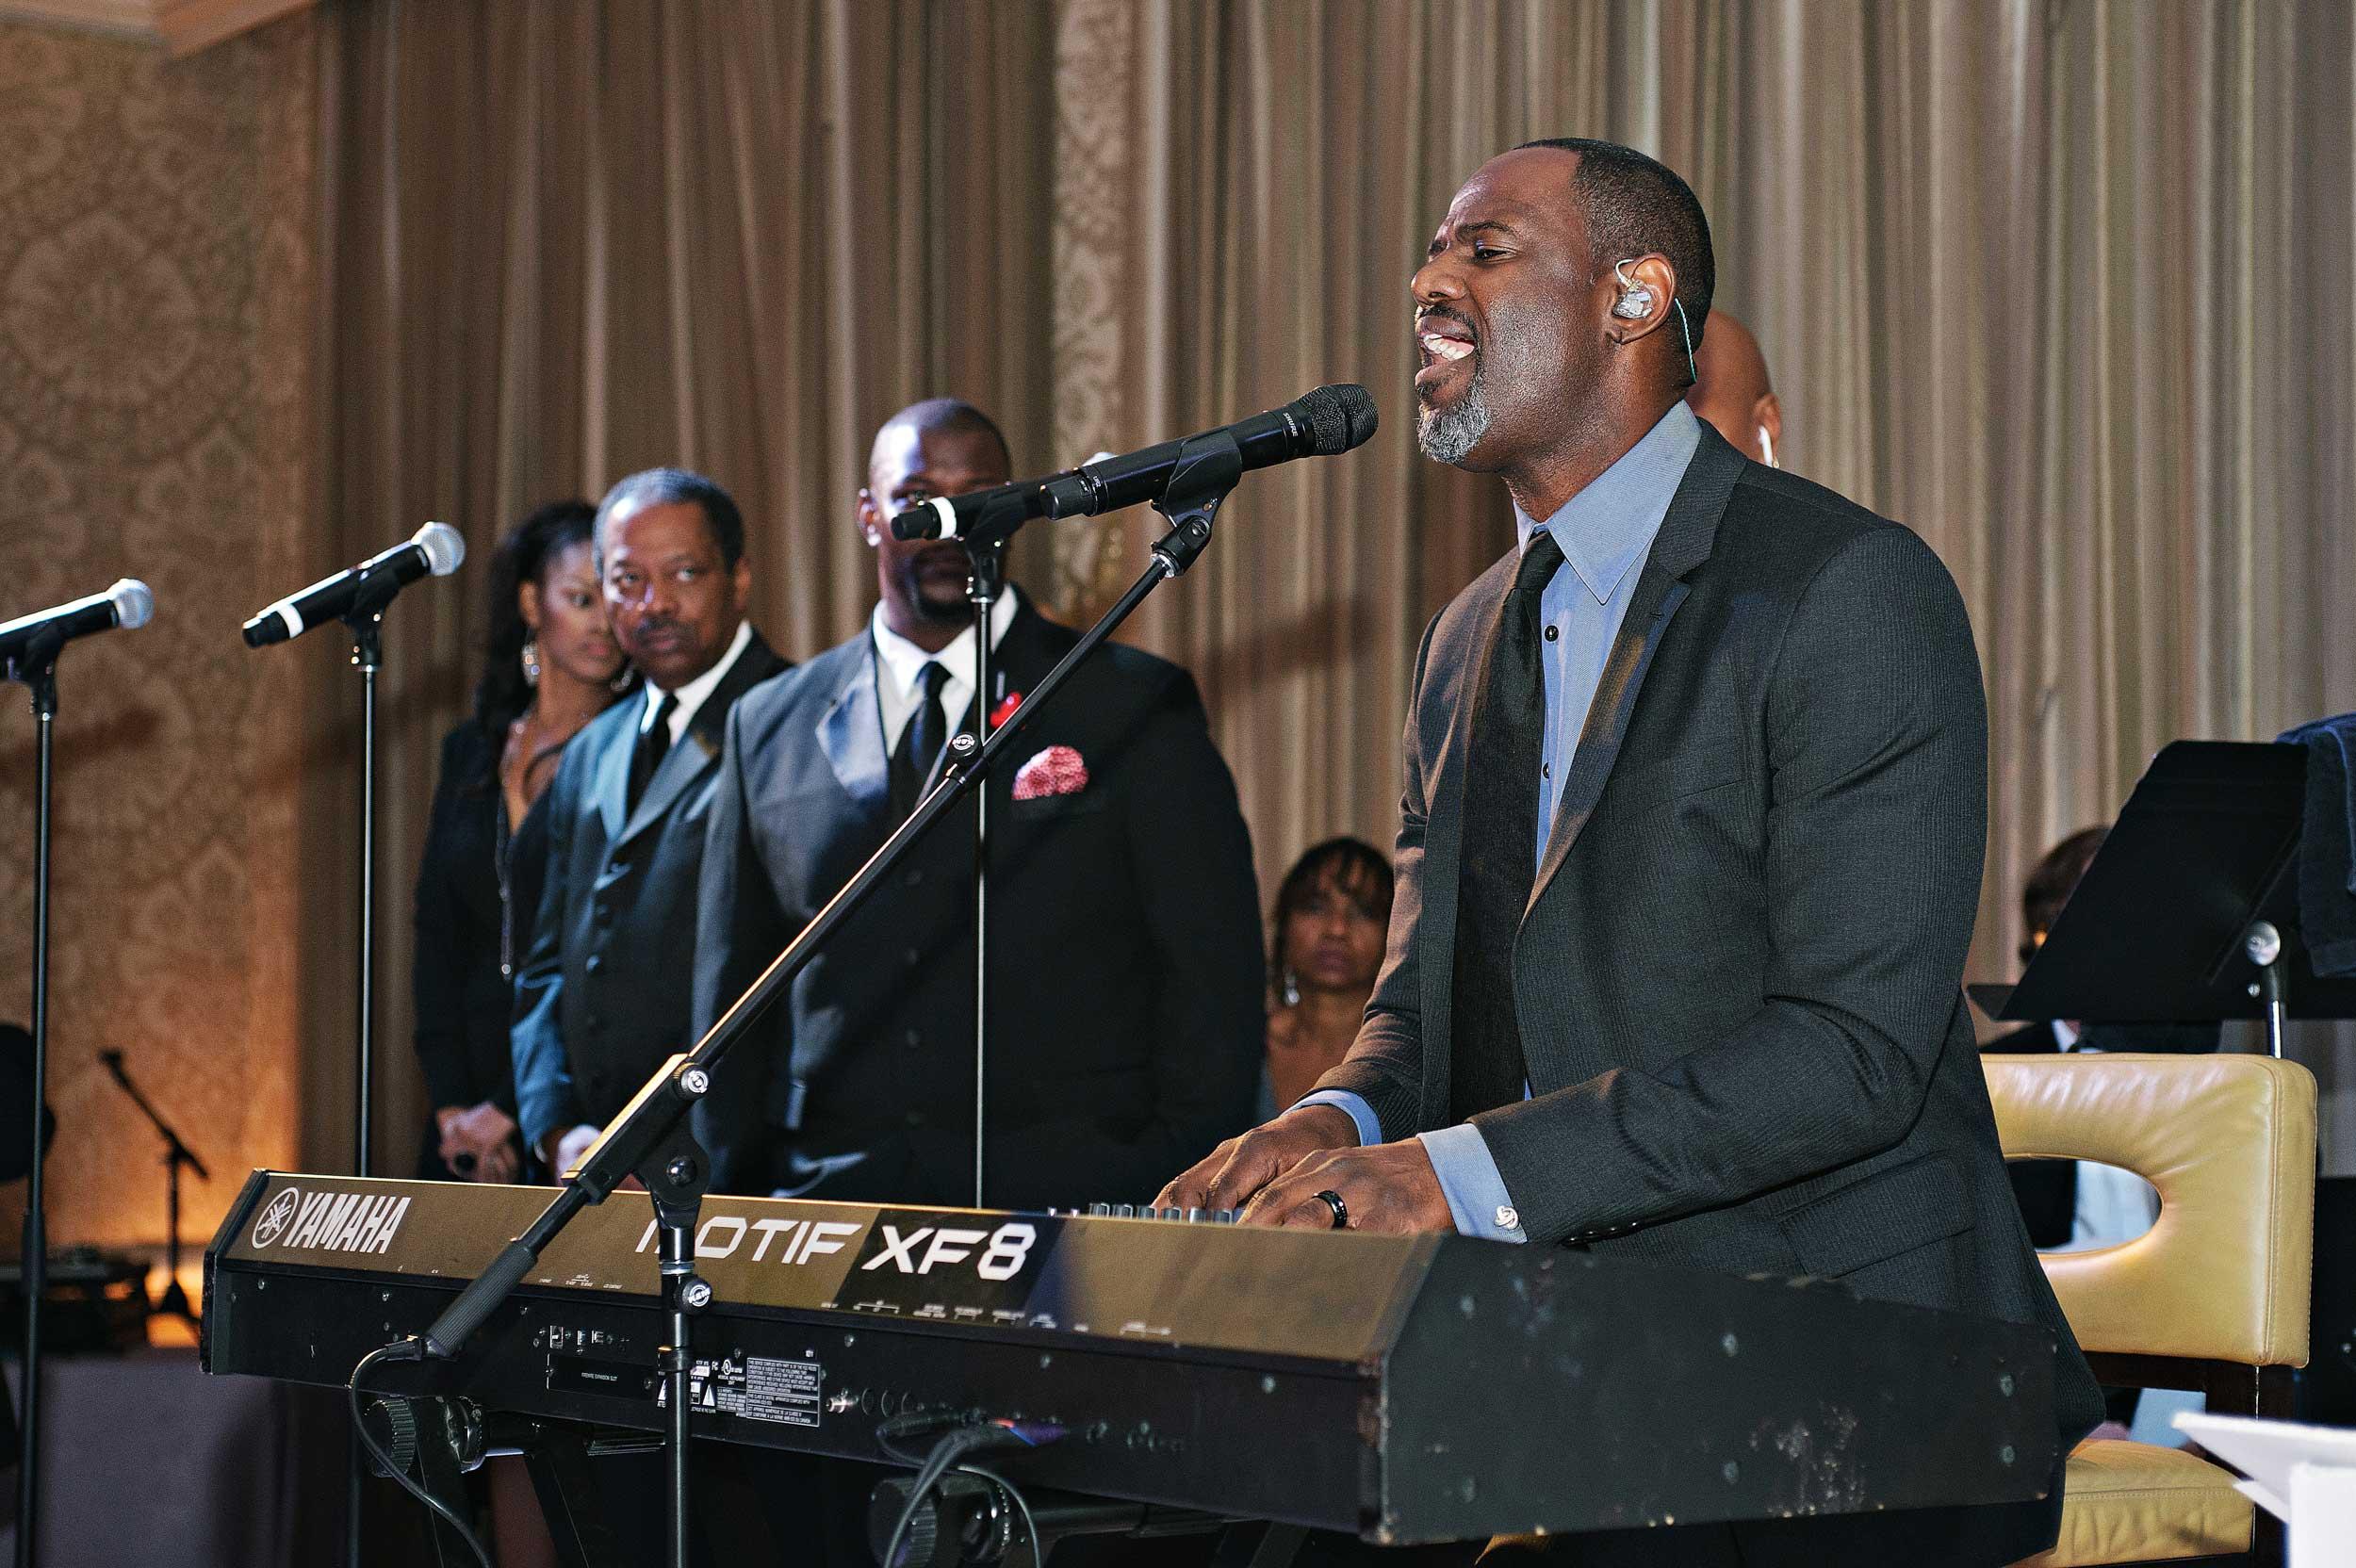 brian mcknight performs at wedding reception